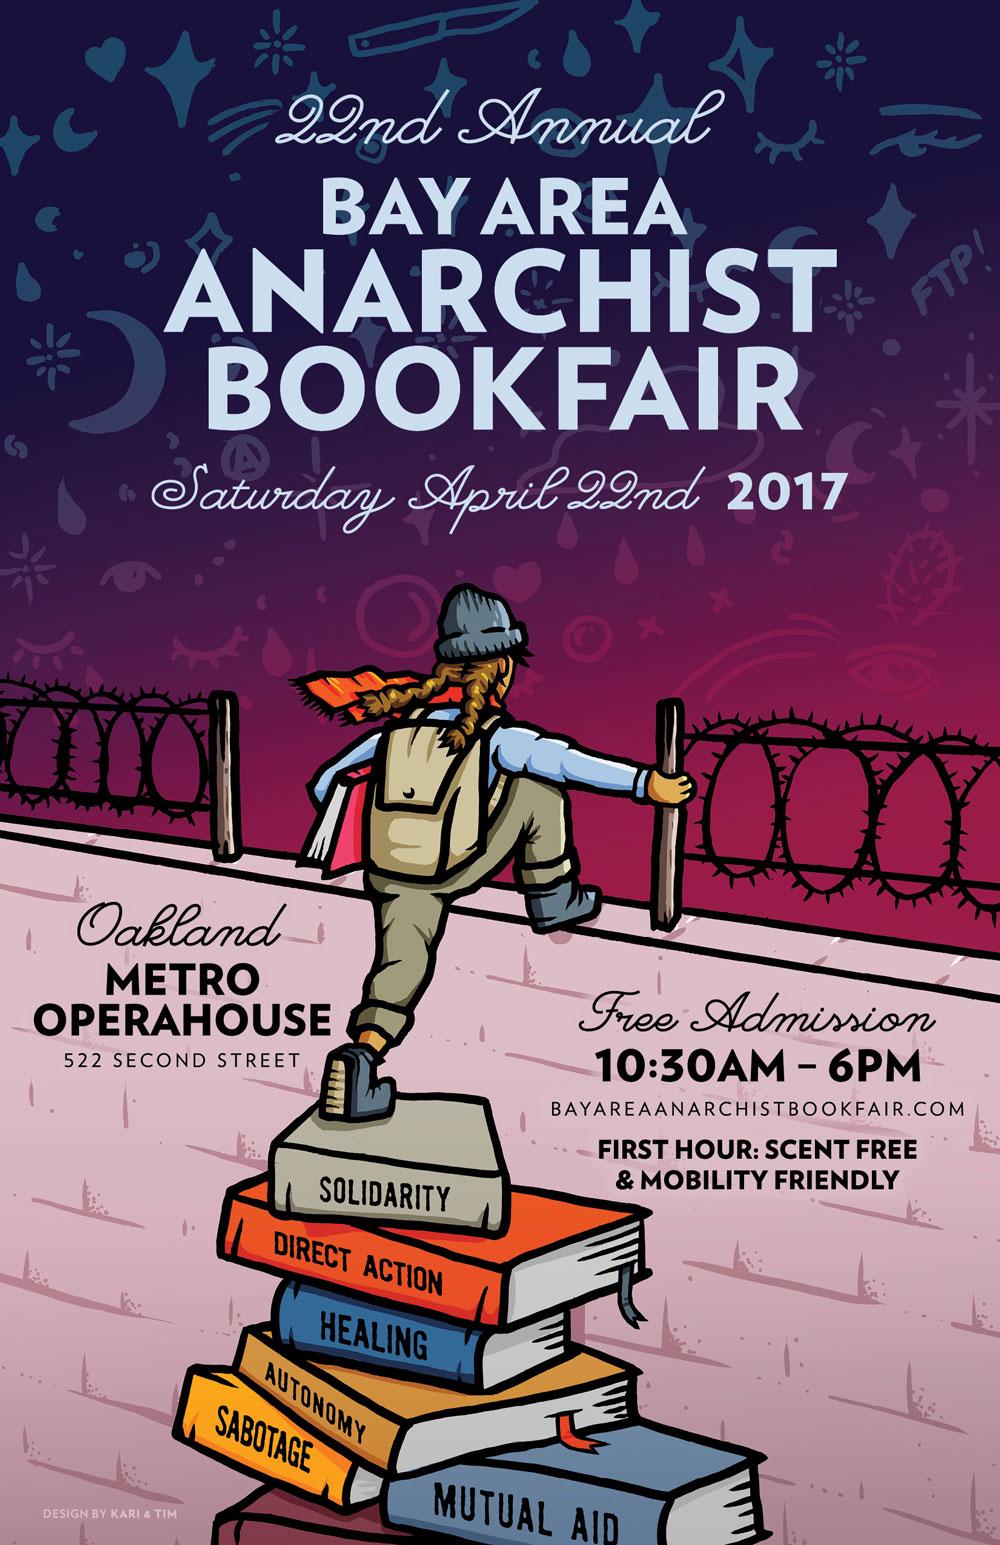 Bay Area Anarchist Bookfair